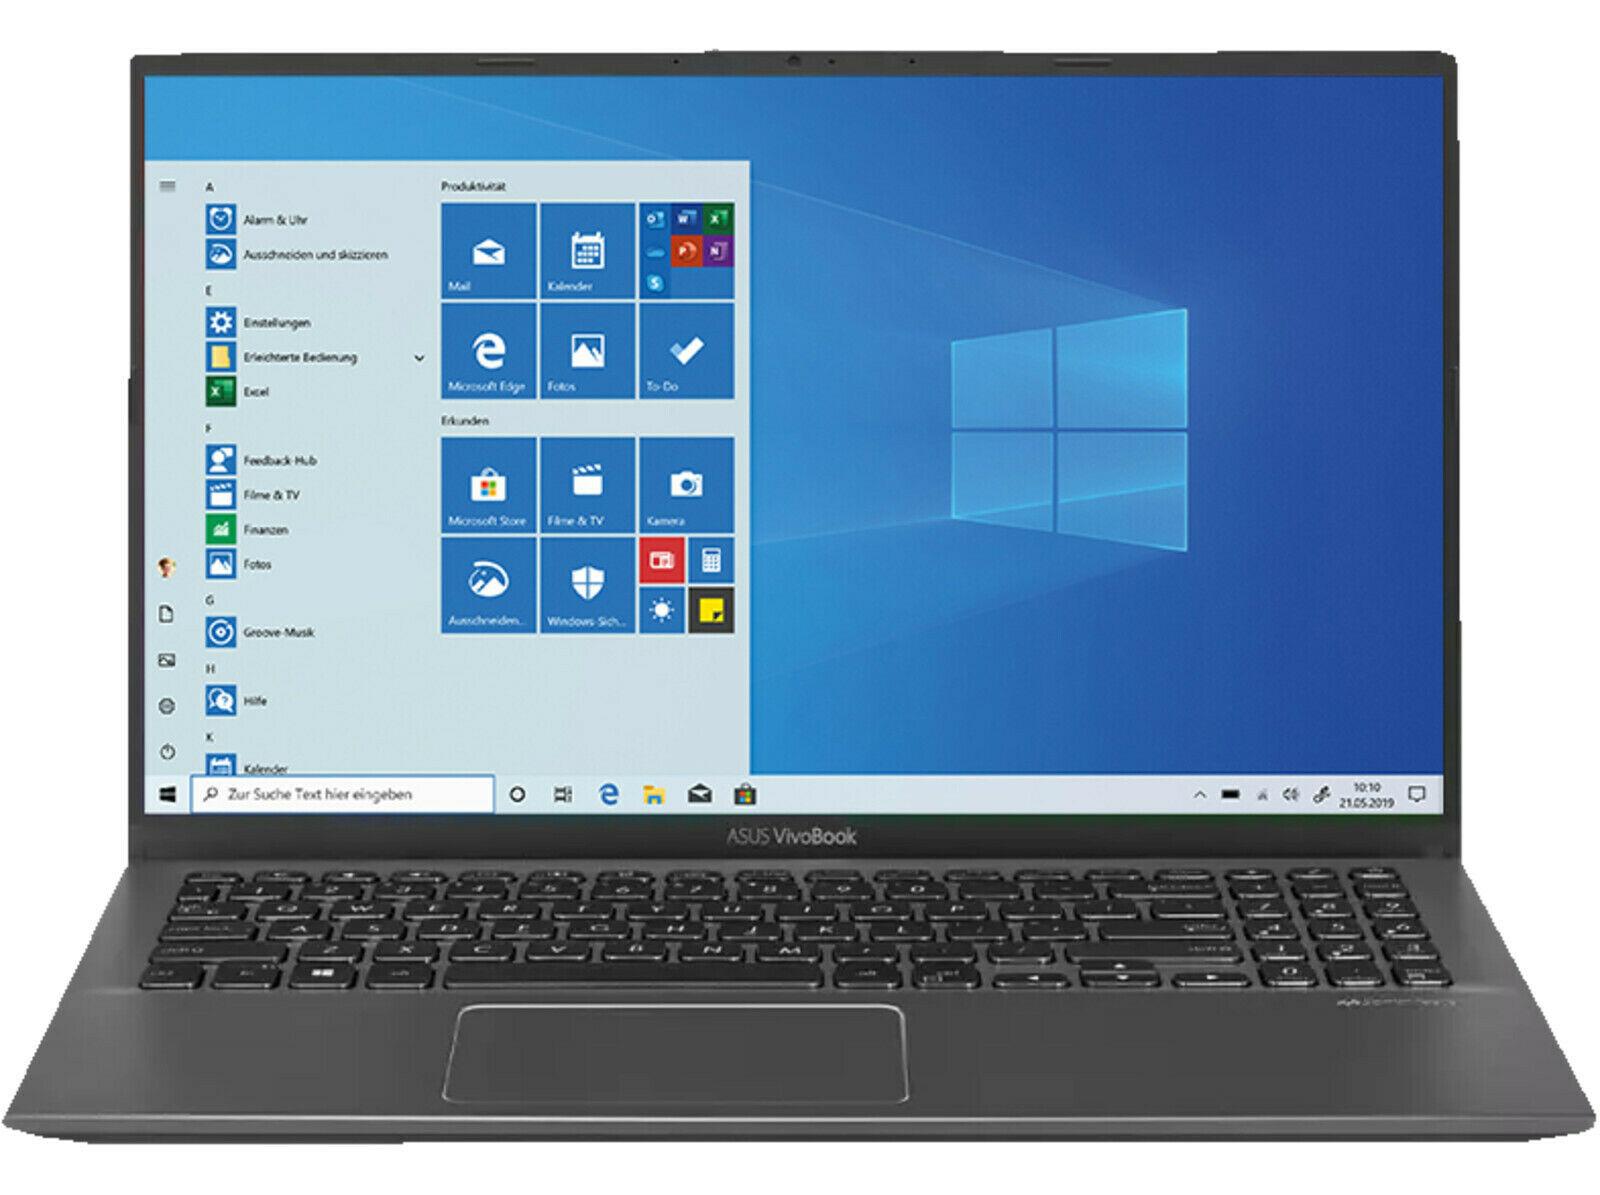 "ASUS VivoBook S15 - 15,6"" FHD Matt, Intel® Core™ i3-1005G1, 8GB DDR4 RAM, 512GB NVMe SSD, Win10 für 350,05€ (eBay)"